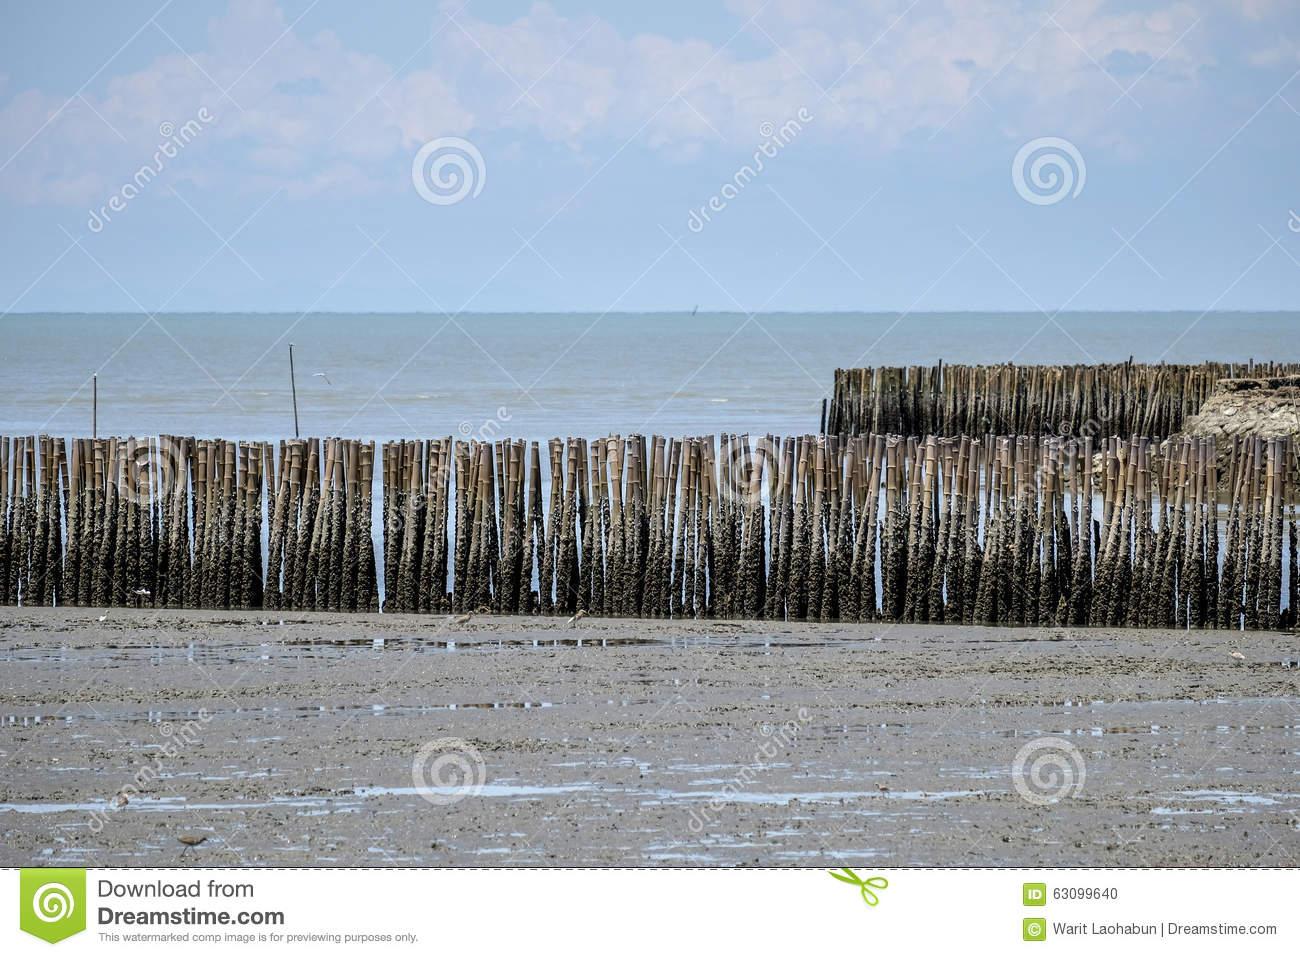 Bamboo Stick Coastal Protection Stock Photo.